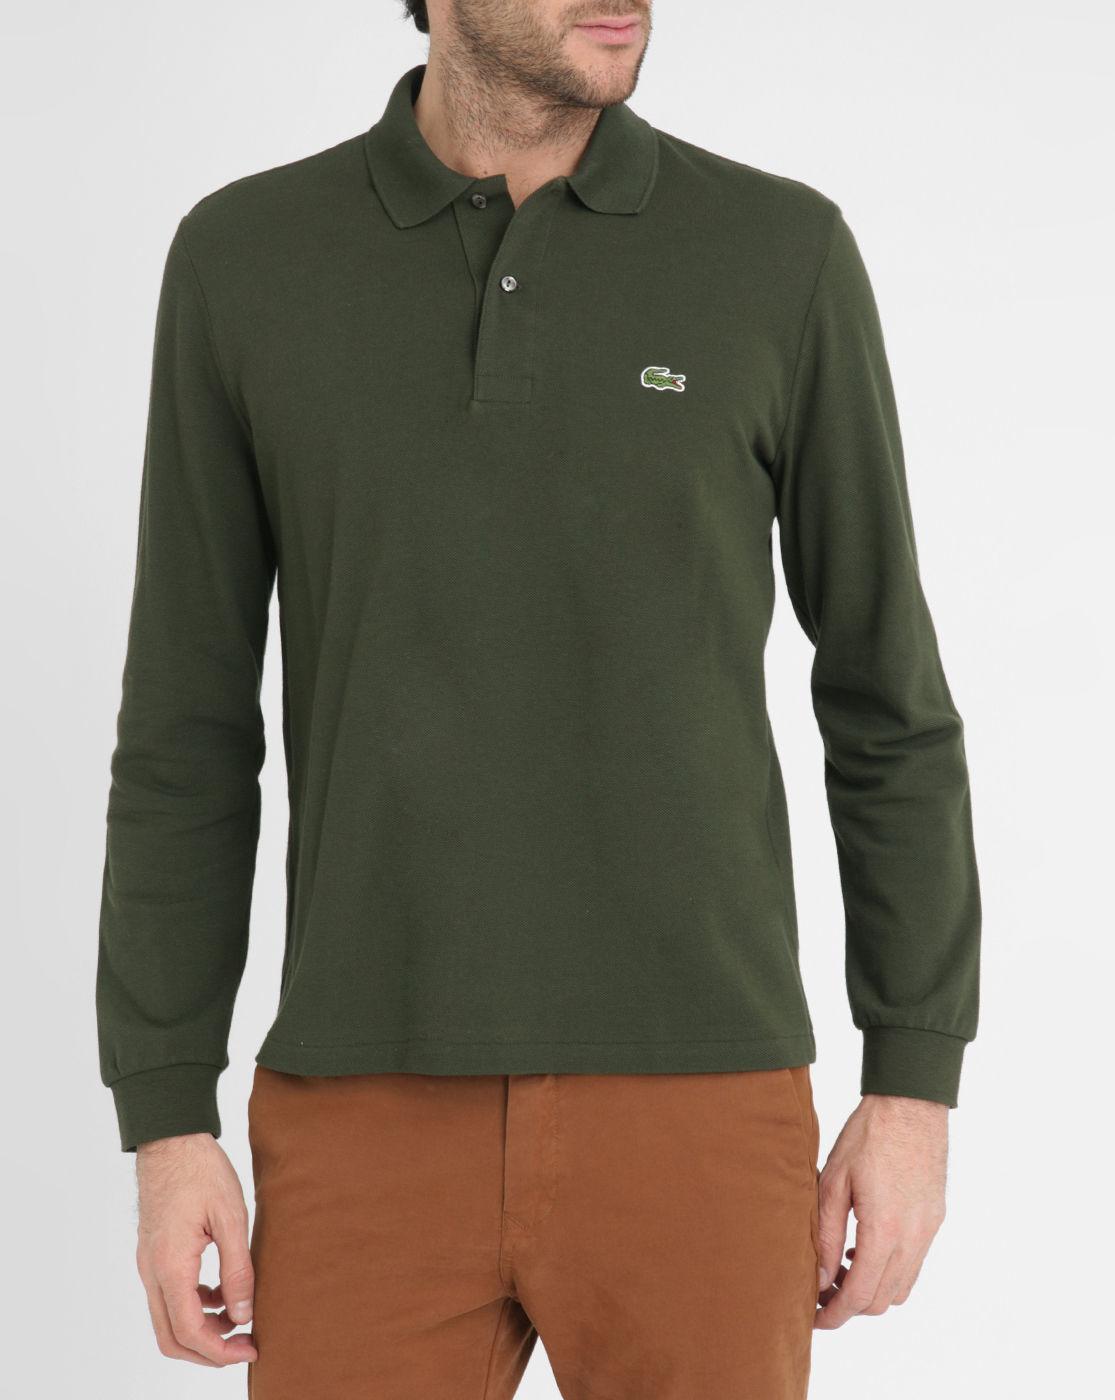 Lacoste Khaki Long Sleeve Polo Shirt In Green For Men